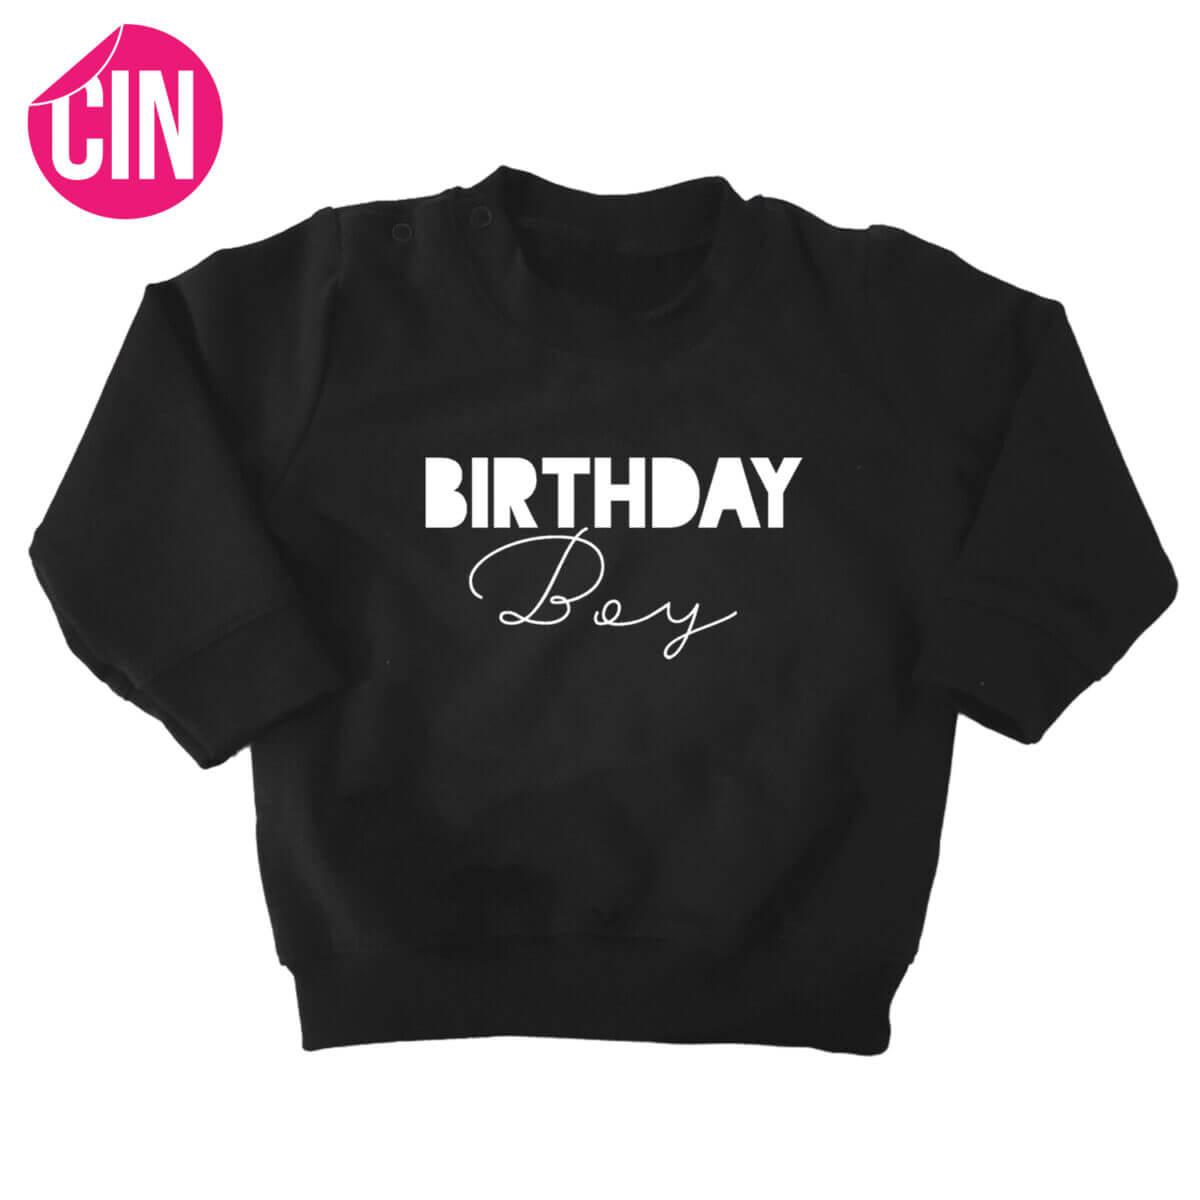 sweater birthday boy cindysigns